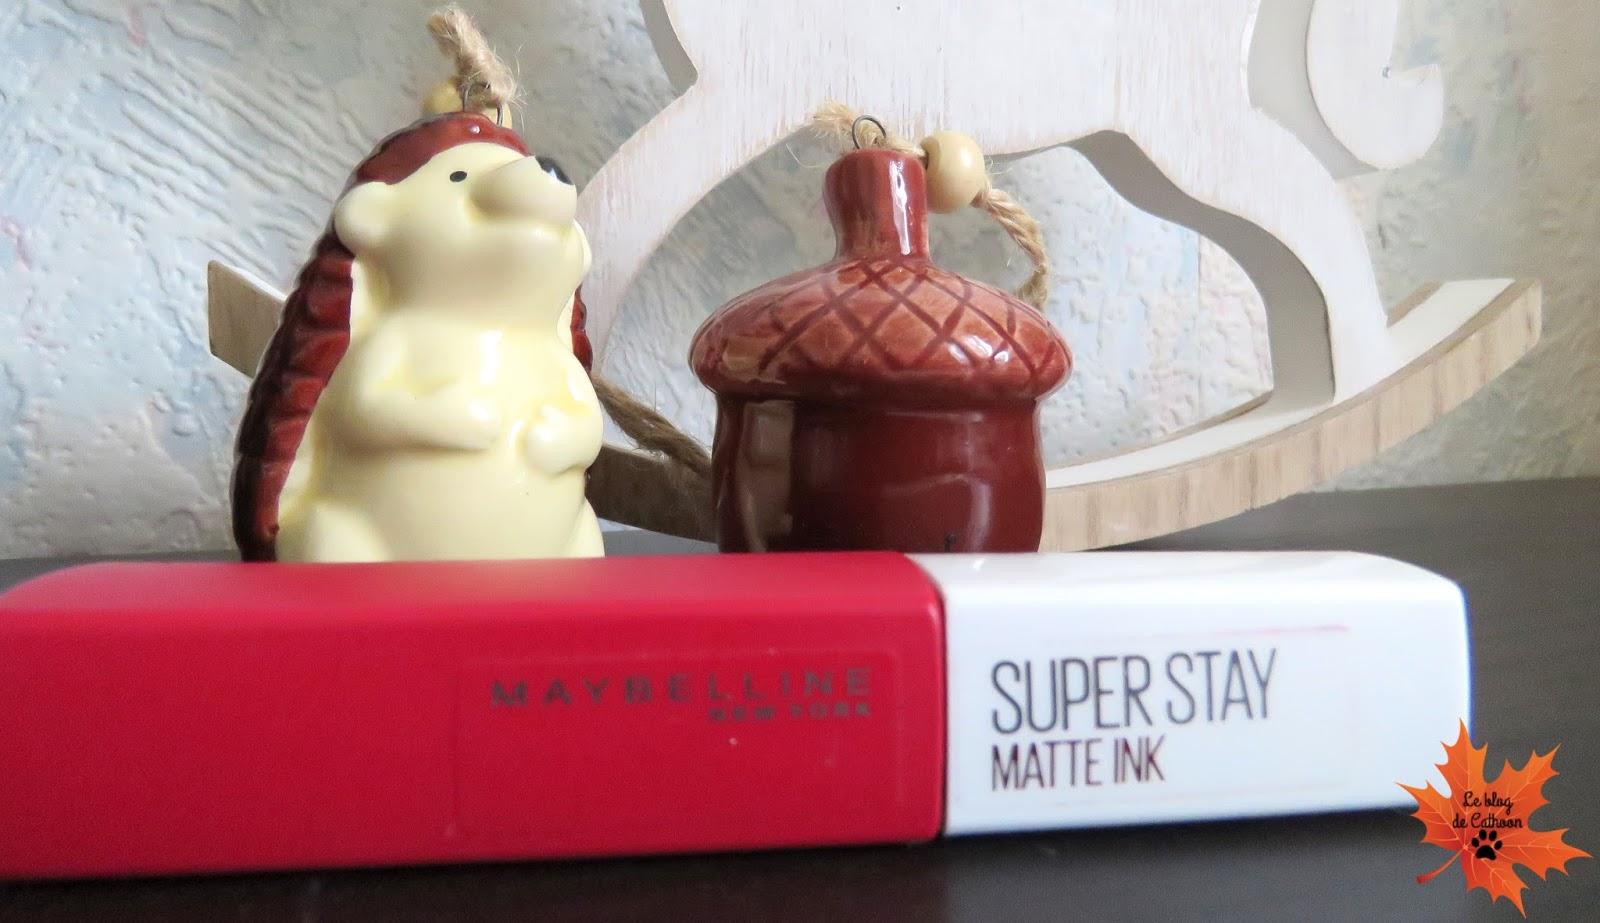 Super Stay Matte Ink de Maybelline